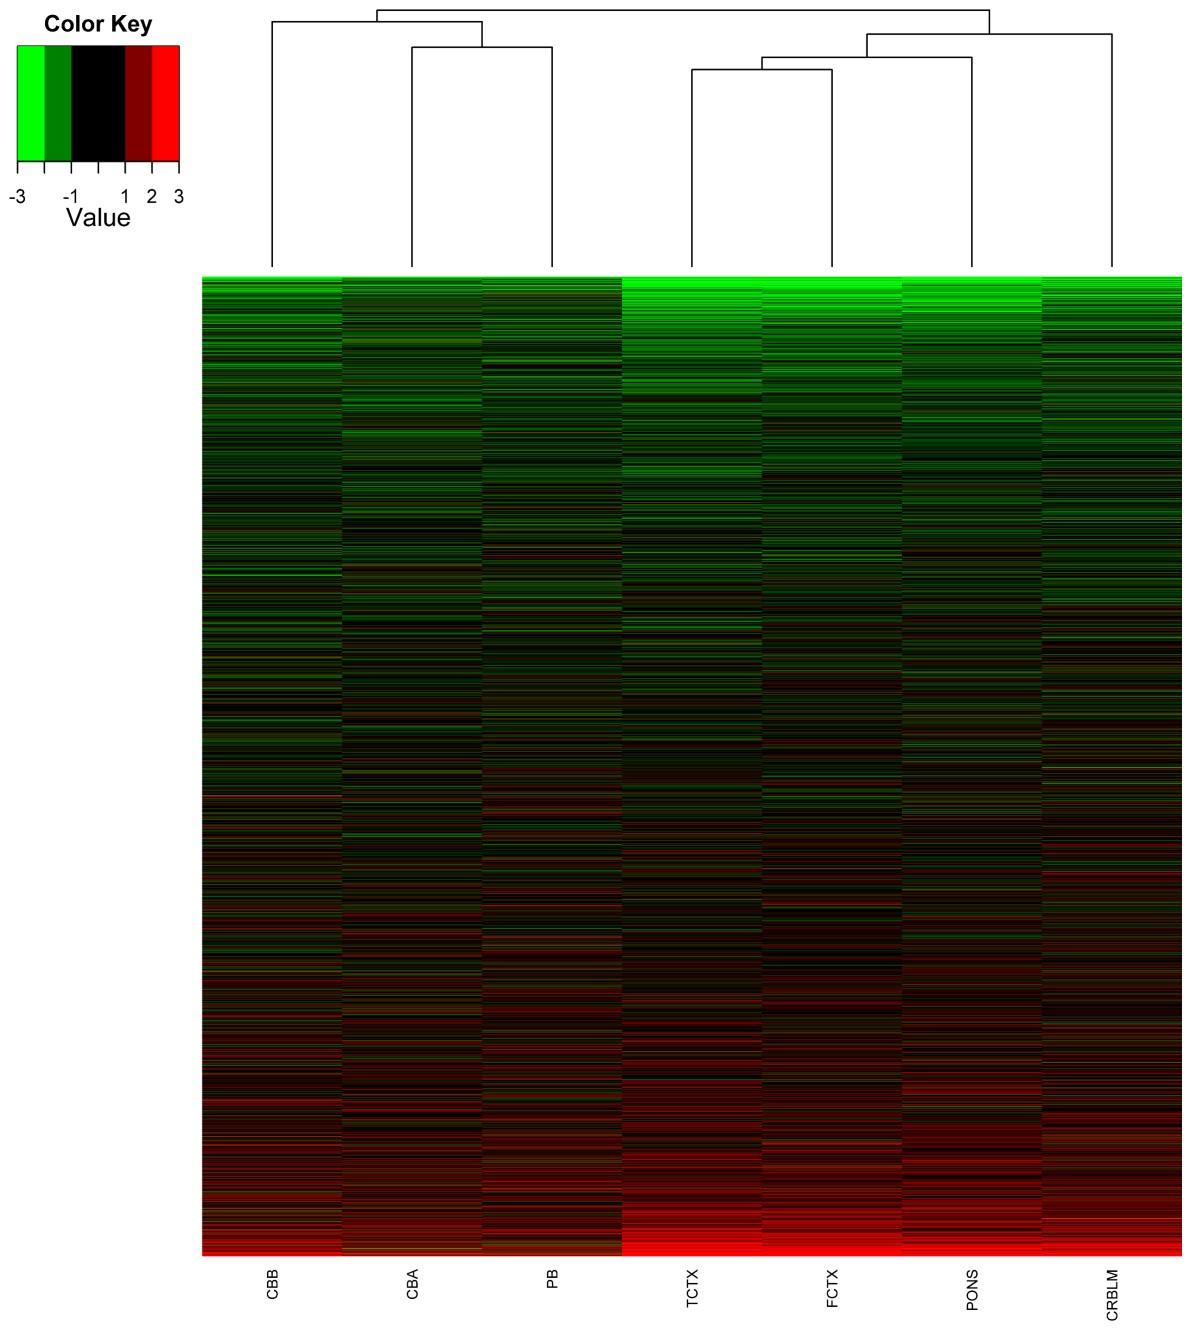 Methylation quantitative trait loci (meQTLs) are consistently ...